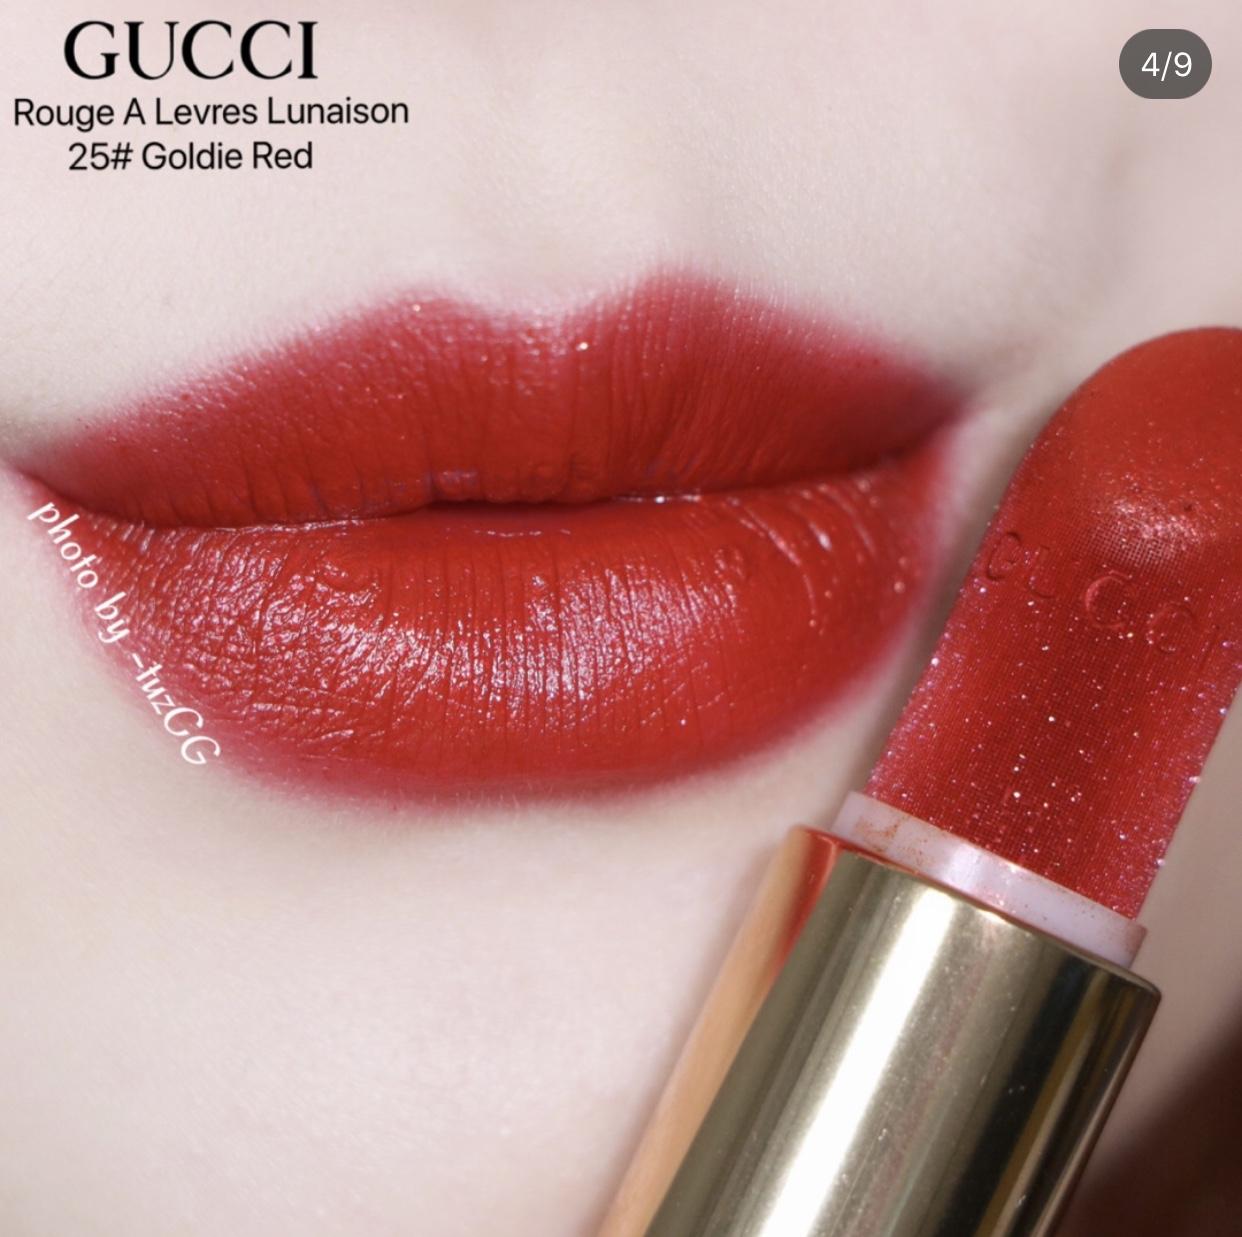 Kết quả hình ảnh cho Gucci Rouge à Lèvres Lunaison